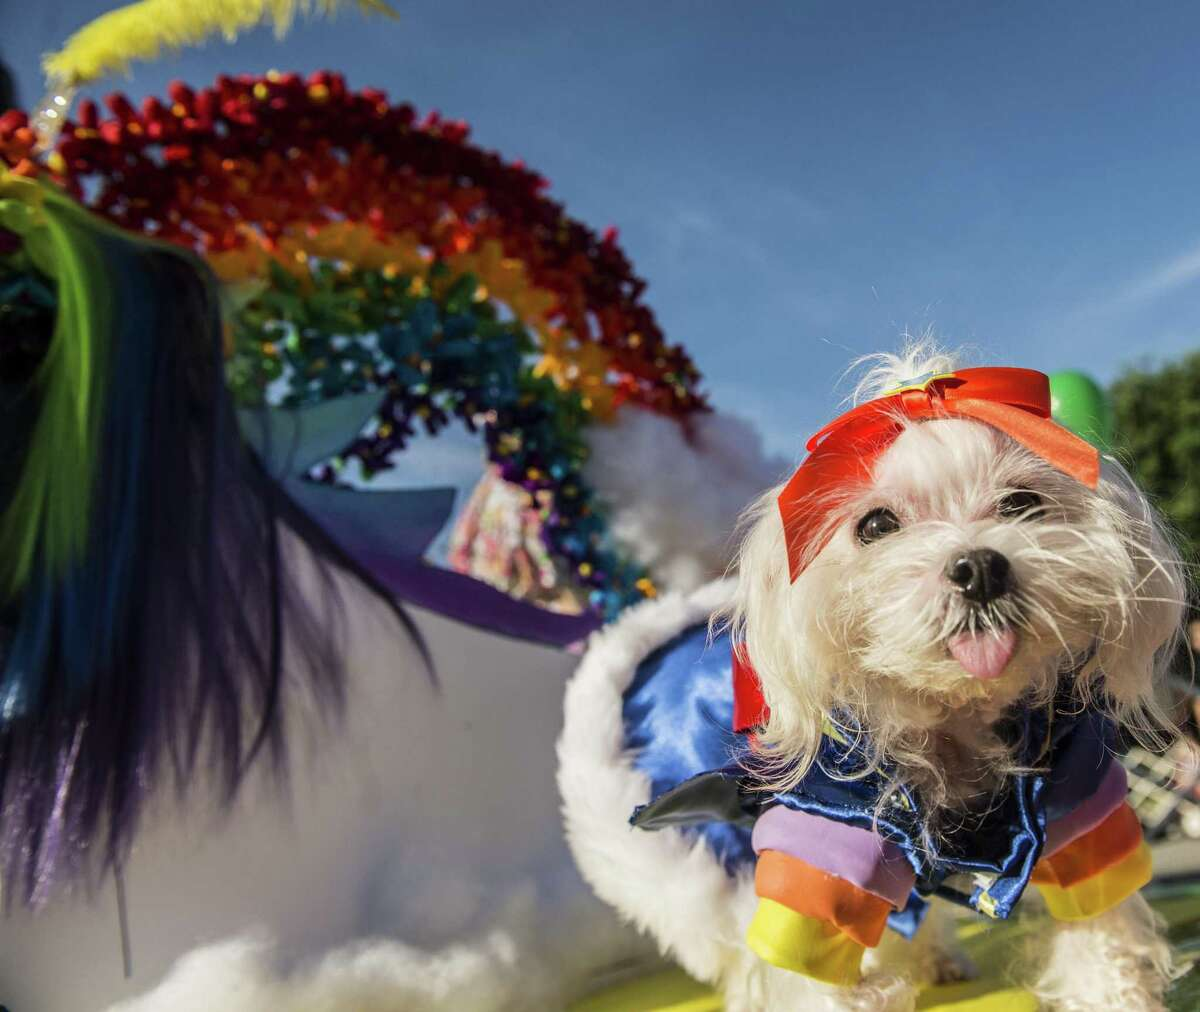 Fiesta Pooch Parade is a fundraiser for Therapy Animals of San Antonio. For more information, go to fiestasanantonio.org.